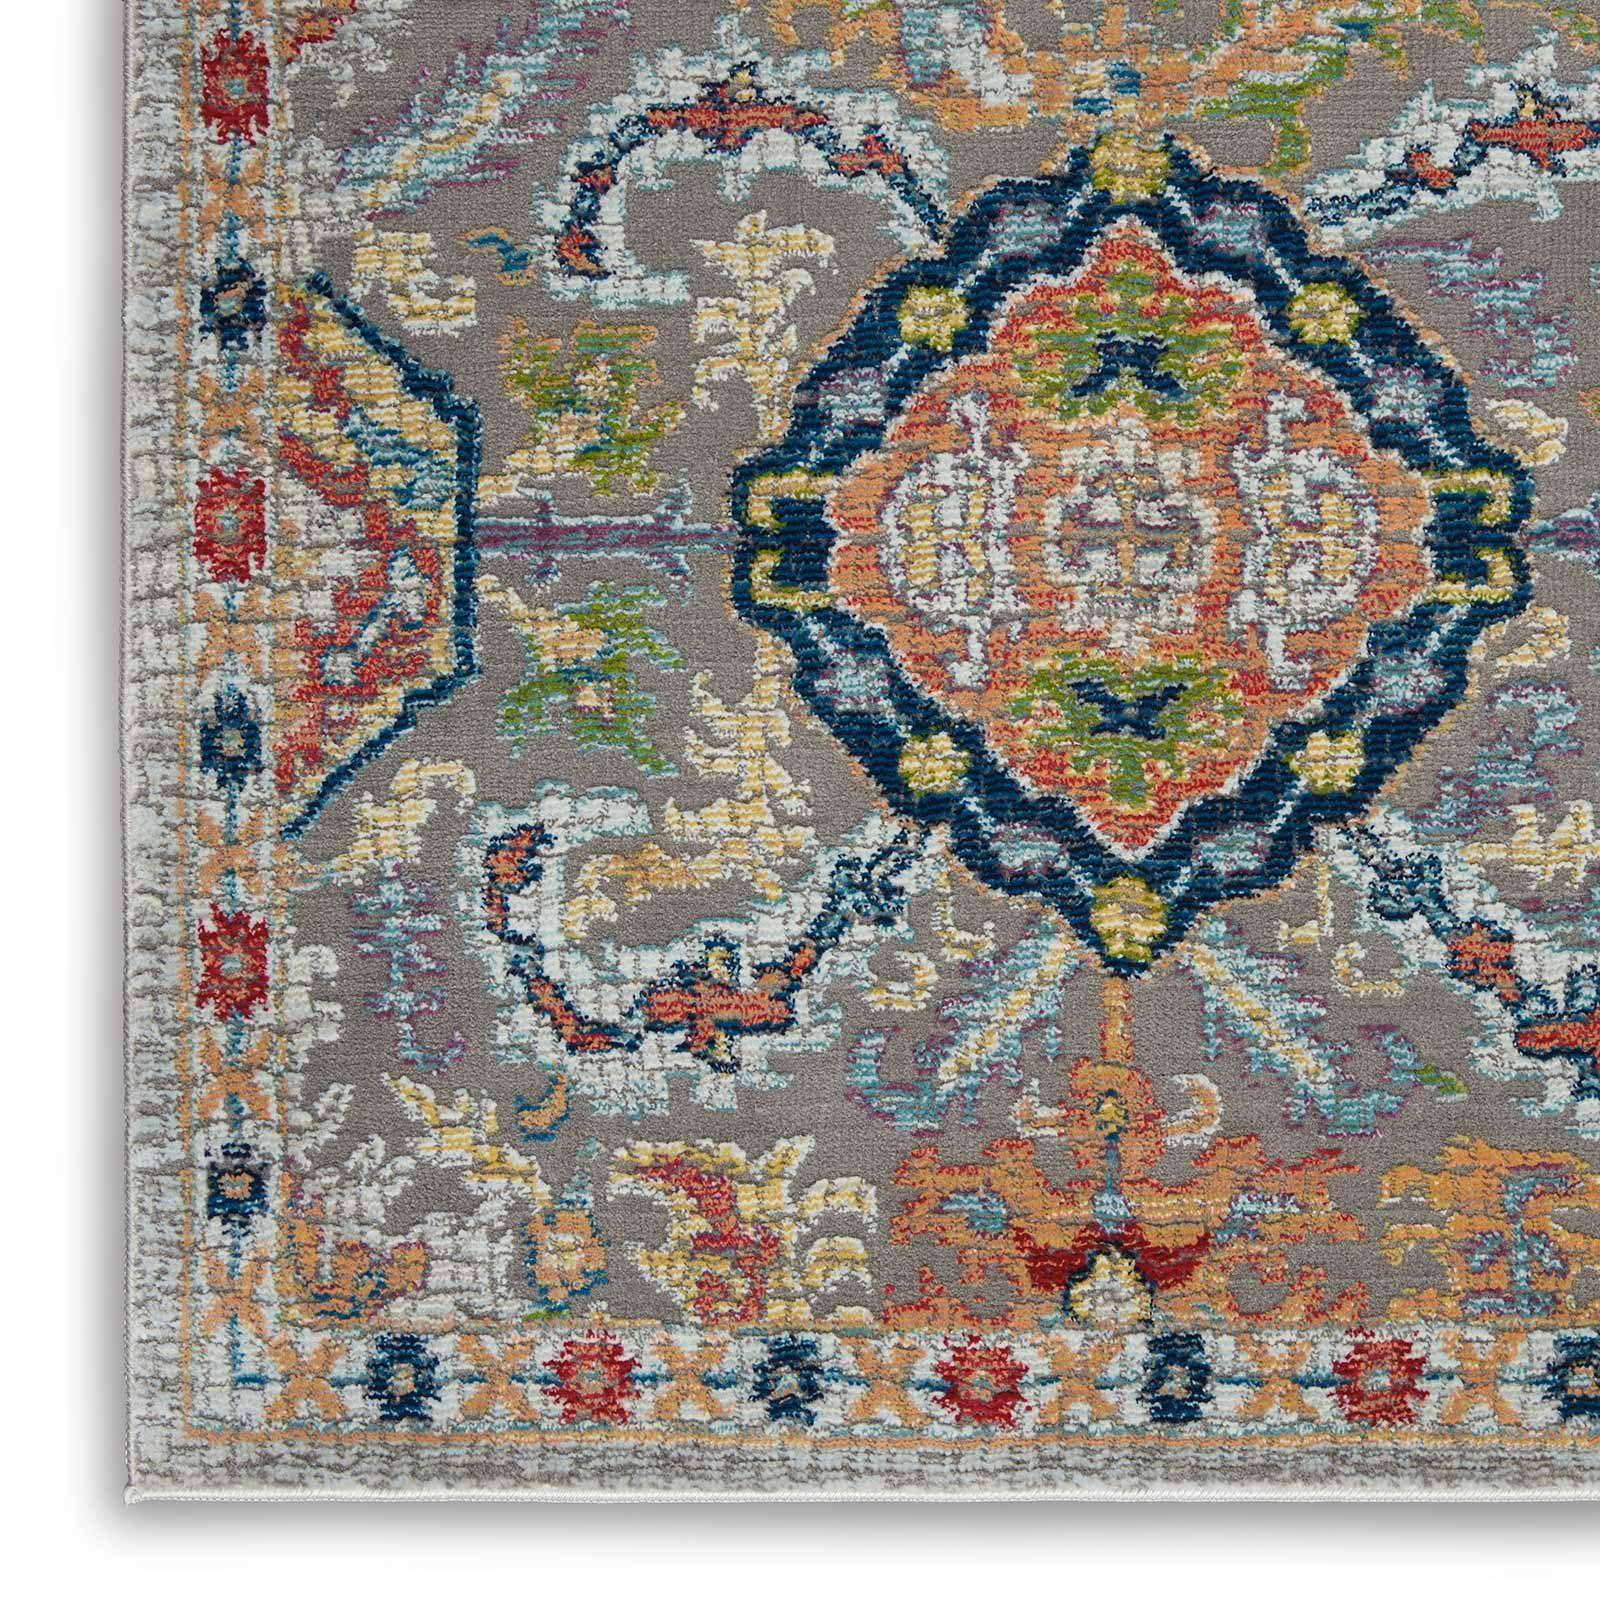 Andessi tapijt Ankara Global ANR12 GRYMT GREY MULTI 5x8 099446498205 CRW C